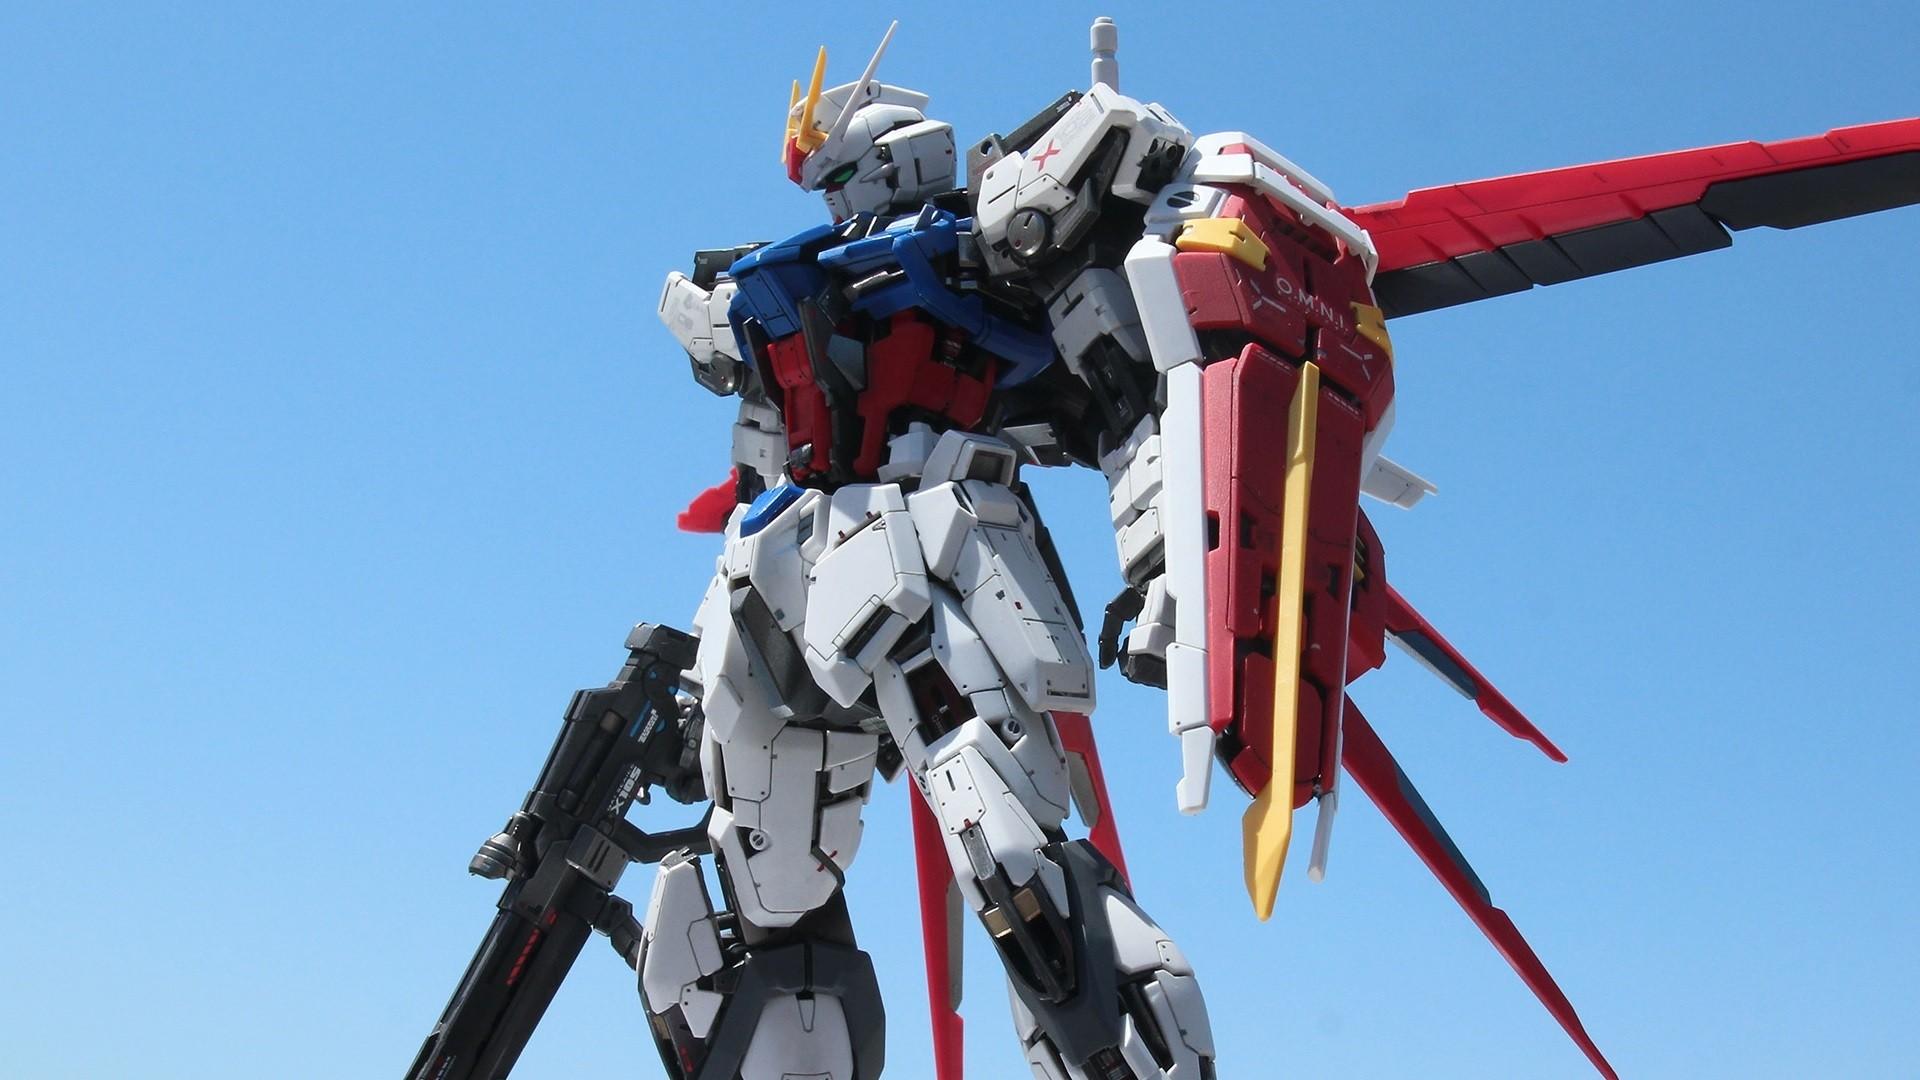 Gundam Wallpaper Free Download